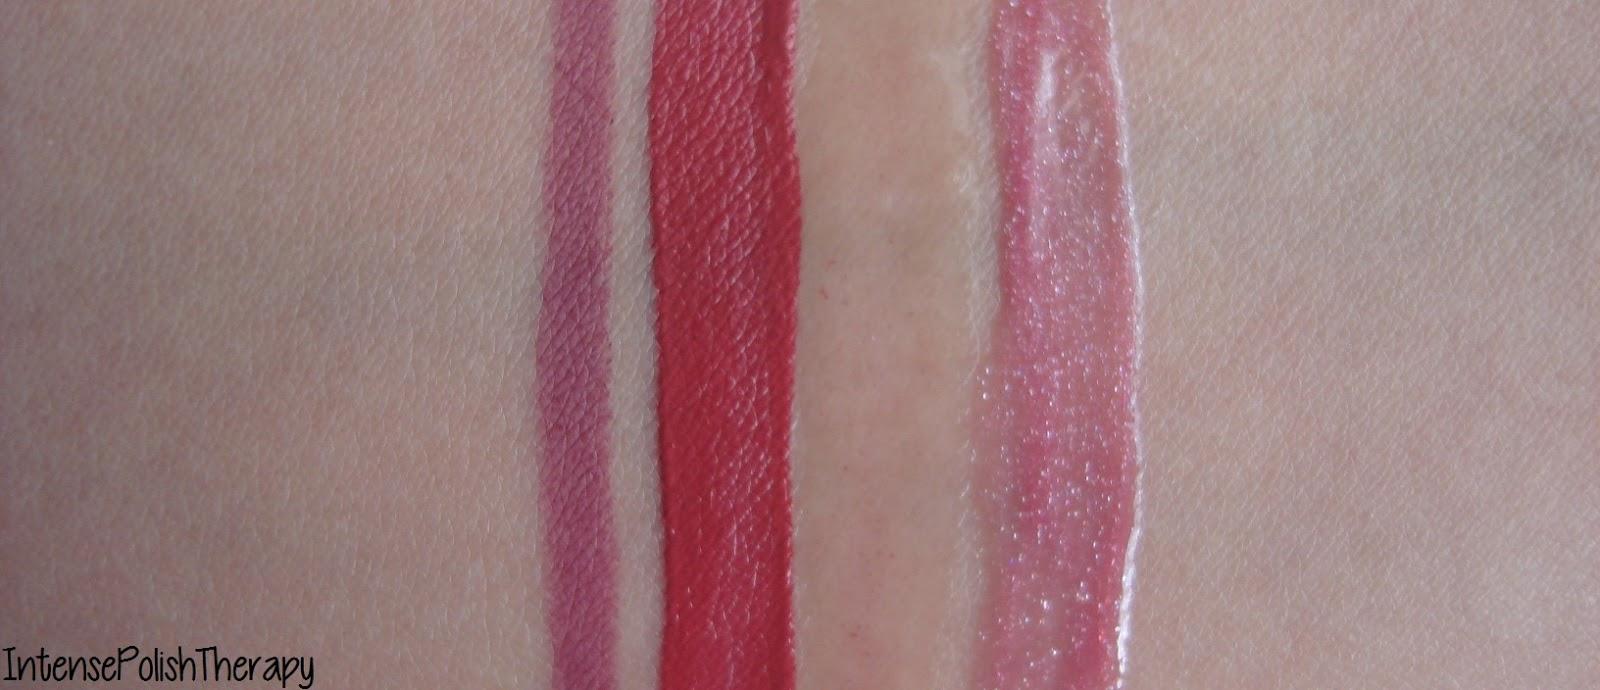 Passionate / Berry Lip Trio: Aqua Lip 10C, Aqua Rouge 50 (NEW shade) & Lab Shine Lip Gloss D4